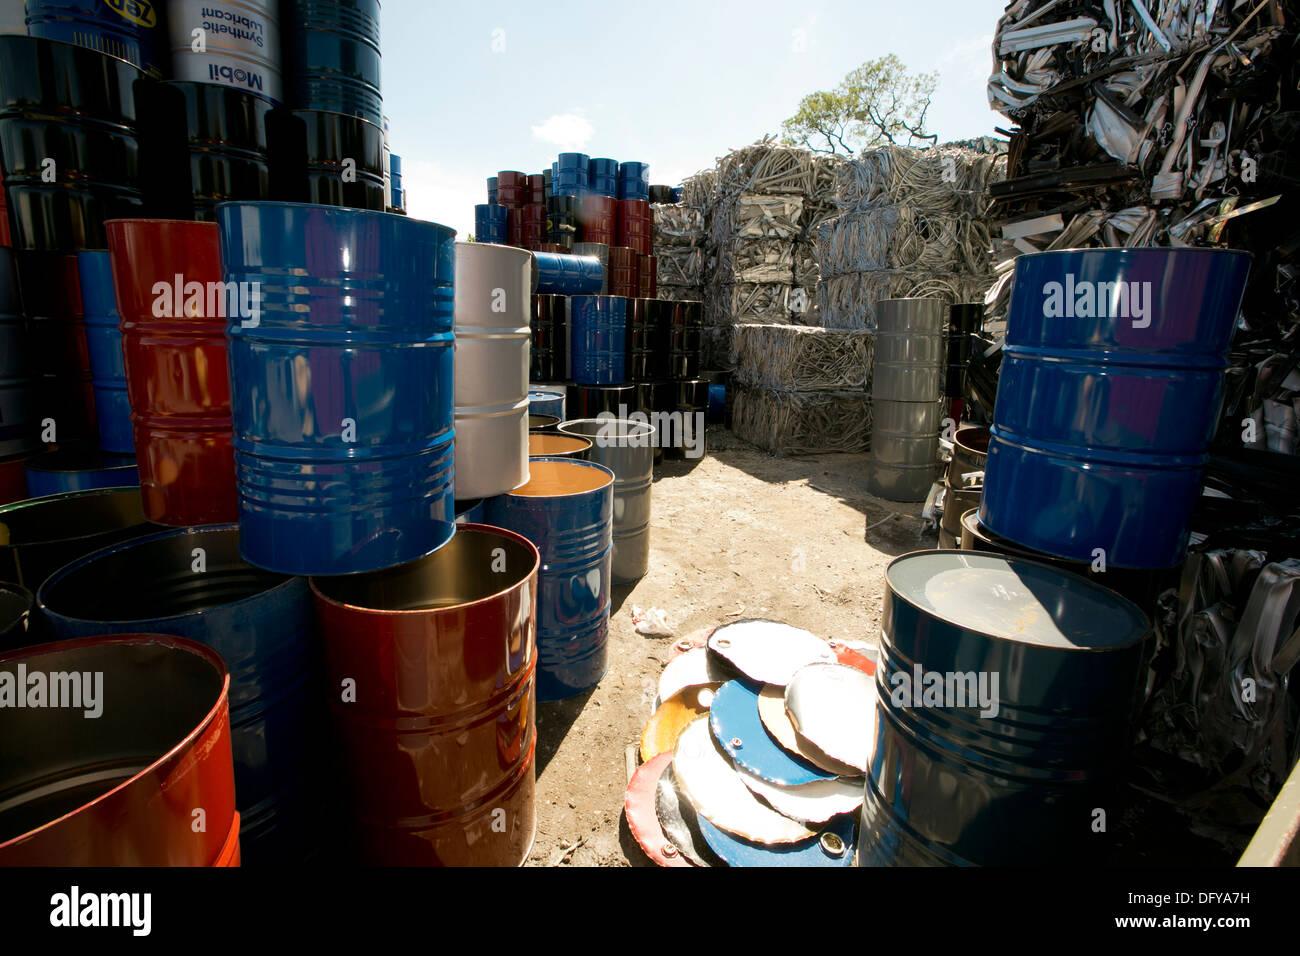 Metal oil barrels brought into scrap metal recycling yard in Texas - Stock Image